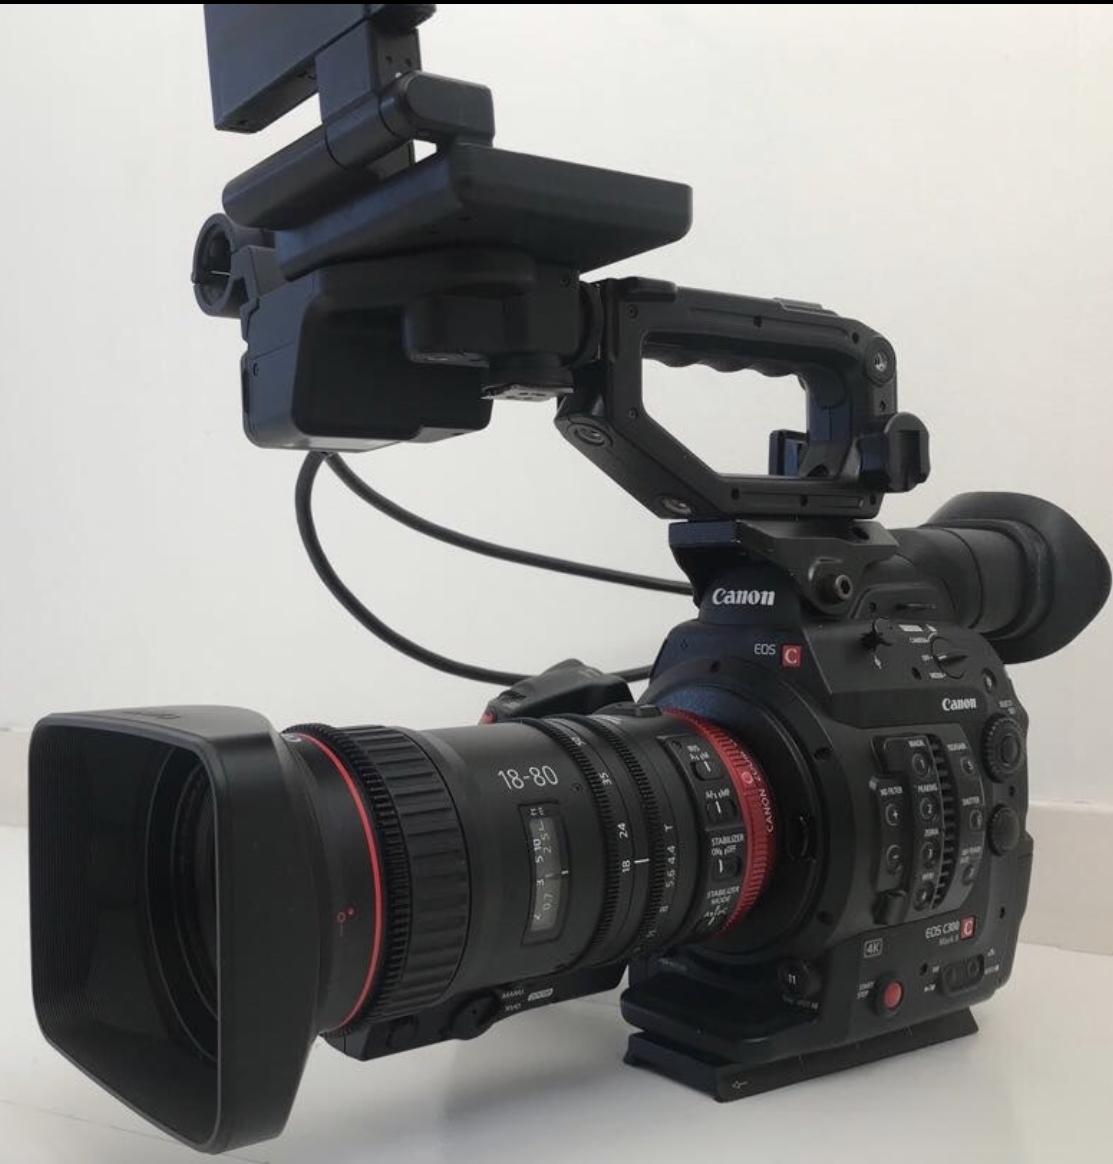 Docu Master - Canon C300 mark ii with Canon CN-E 18-80mm T4,4L IS KAS S (Cine / EF Compact Servo)